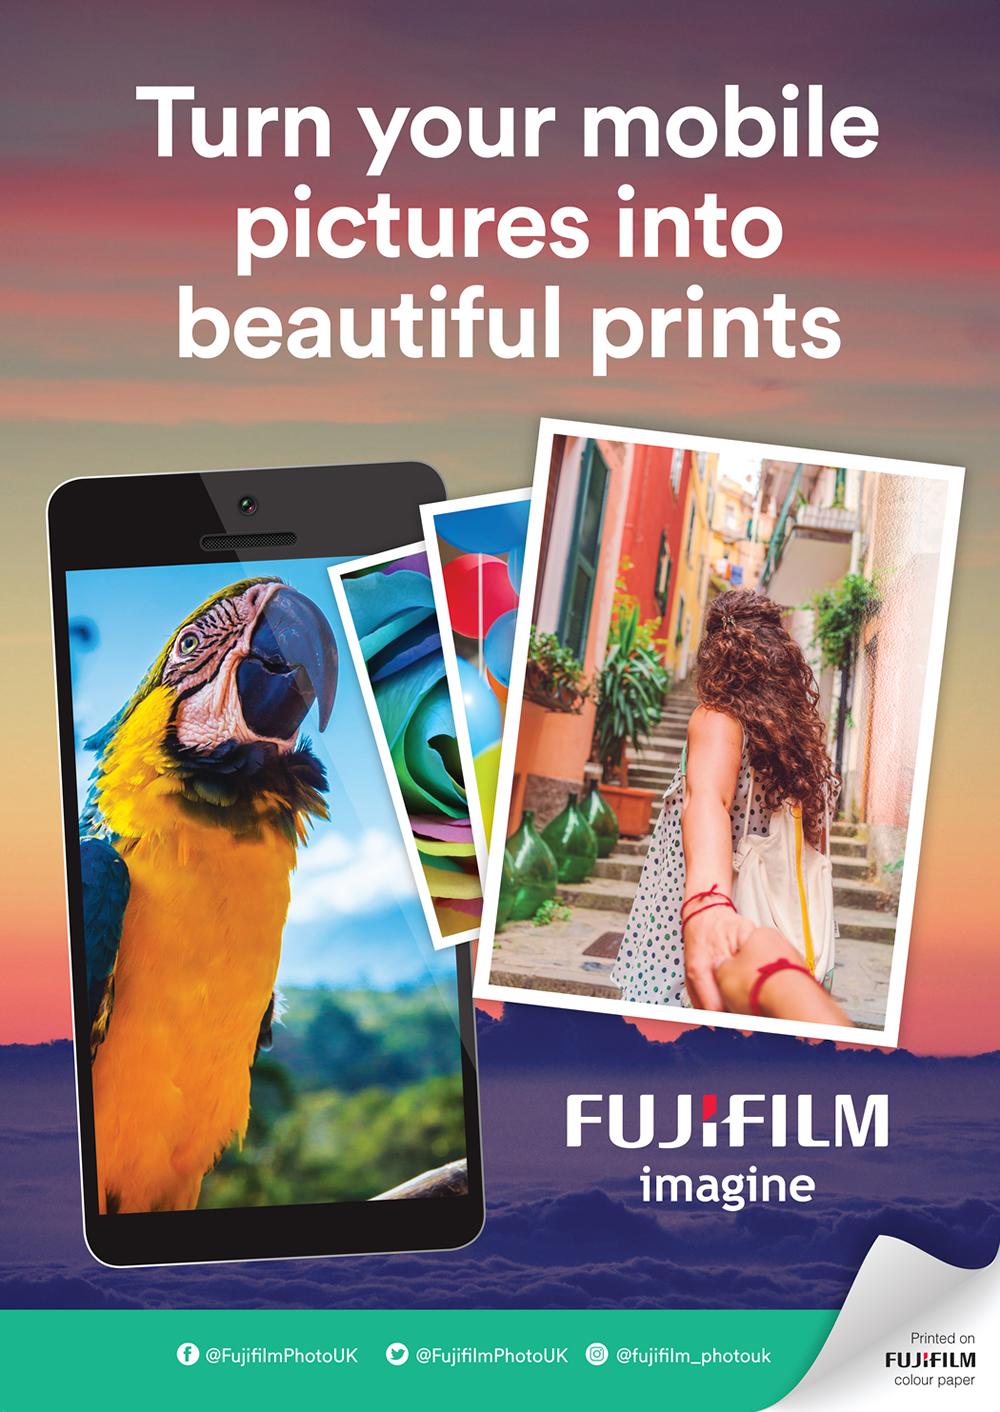 Fujifilm Mobile App